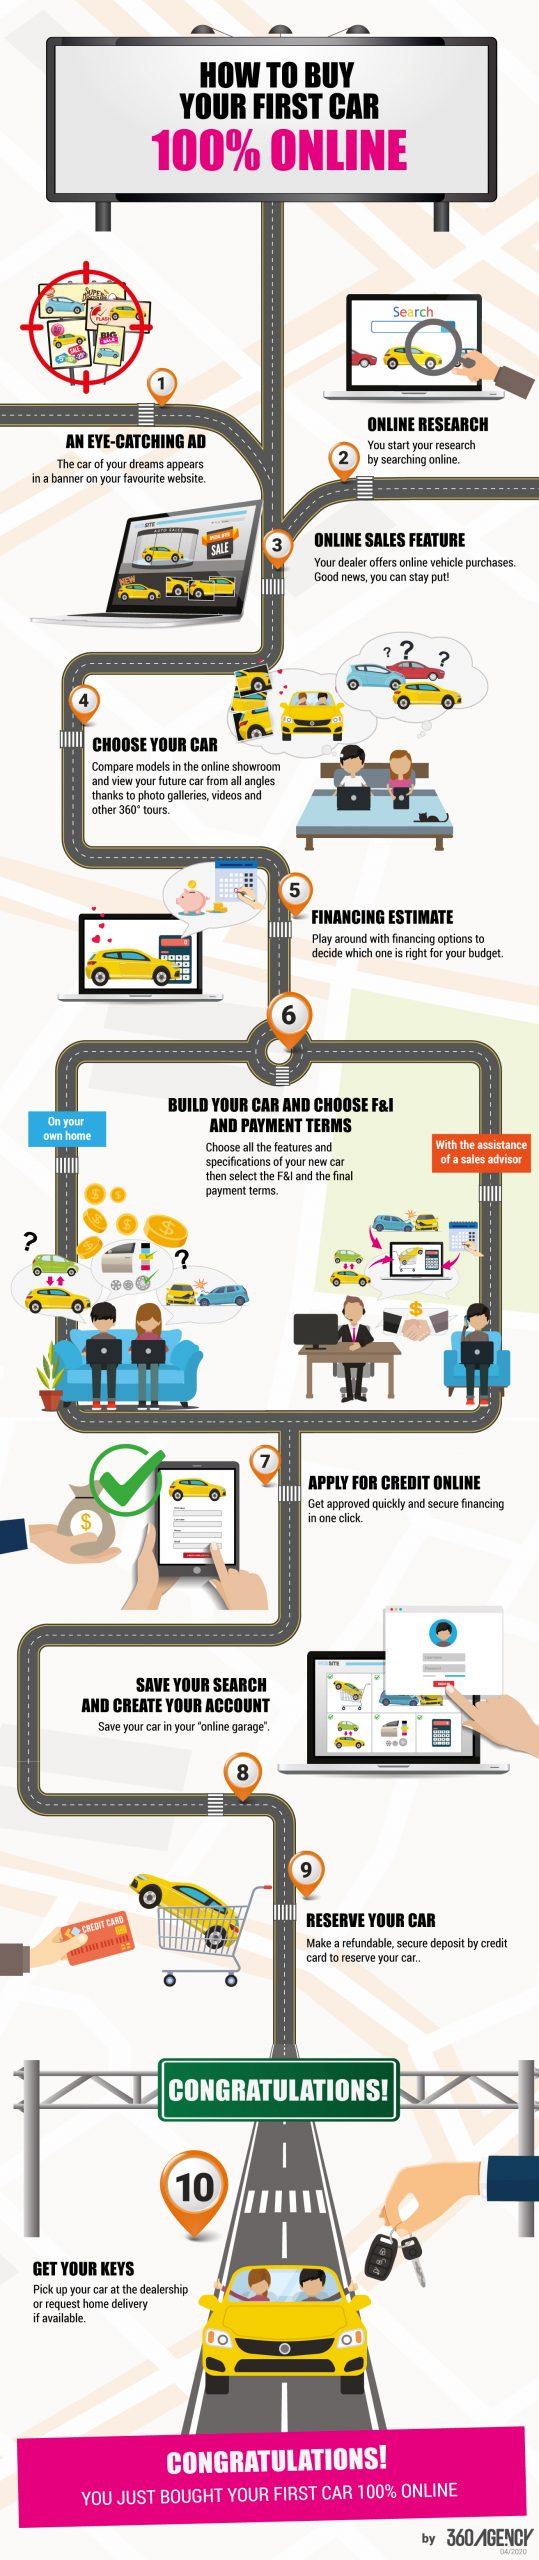 Online customer journey